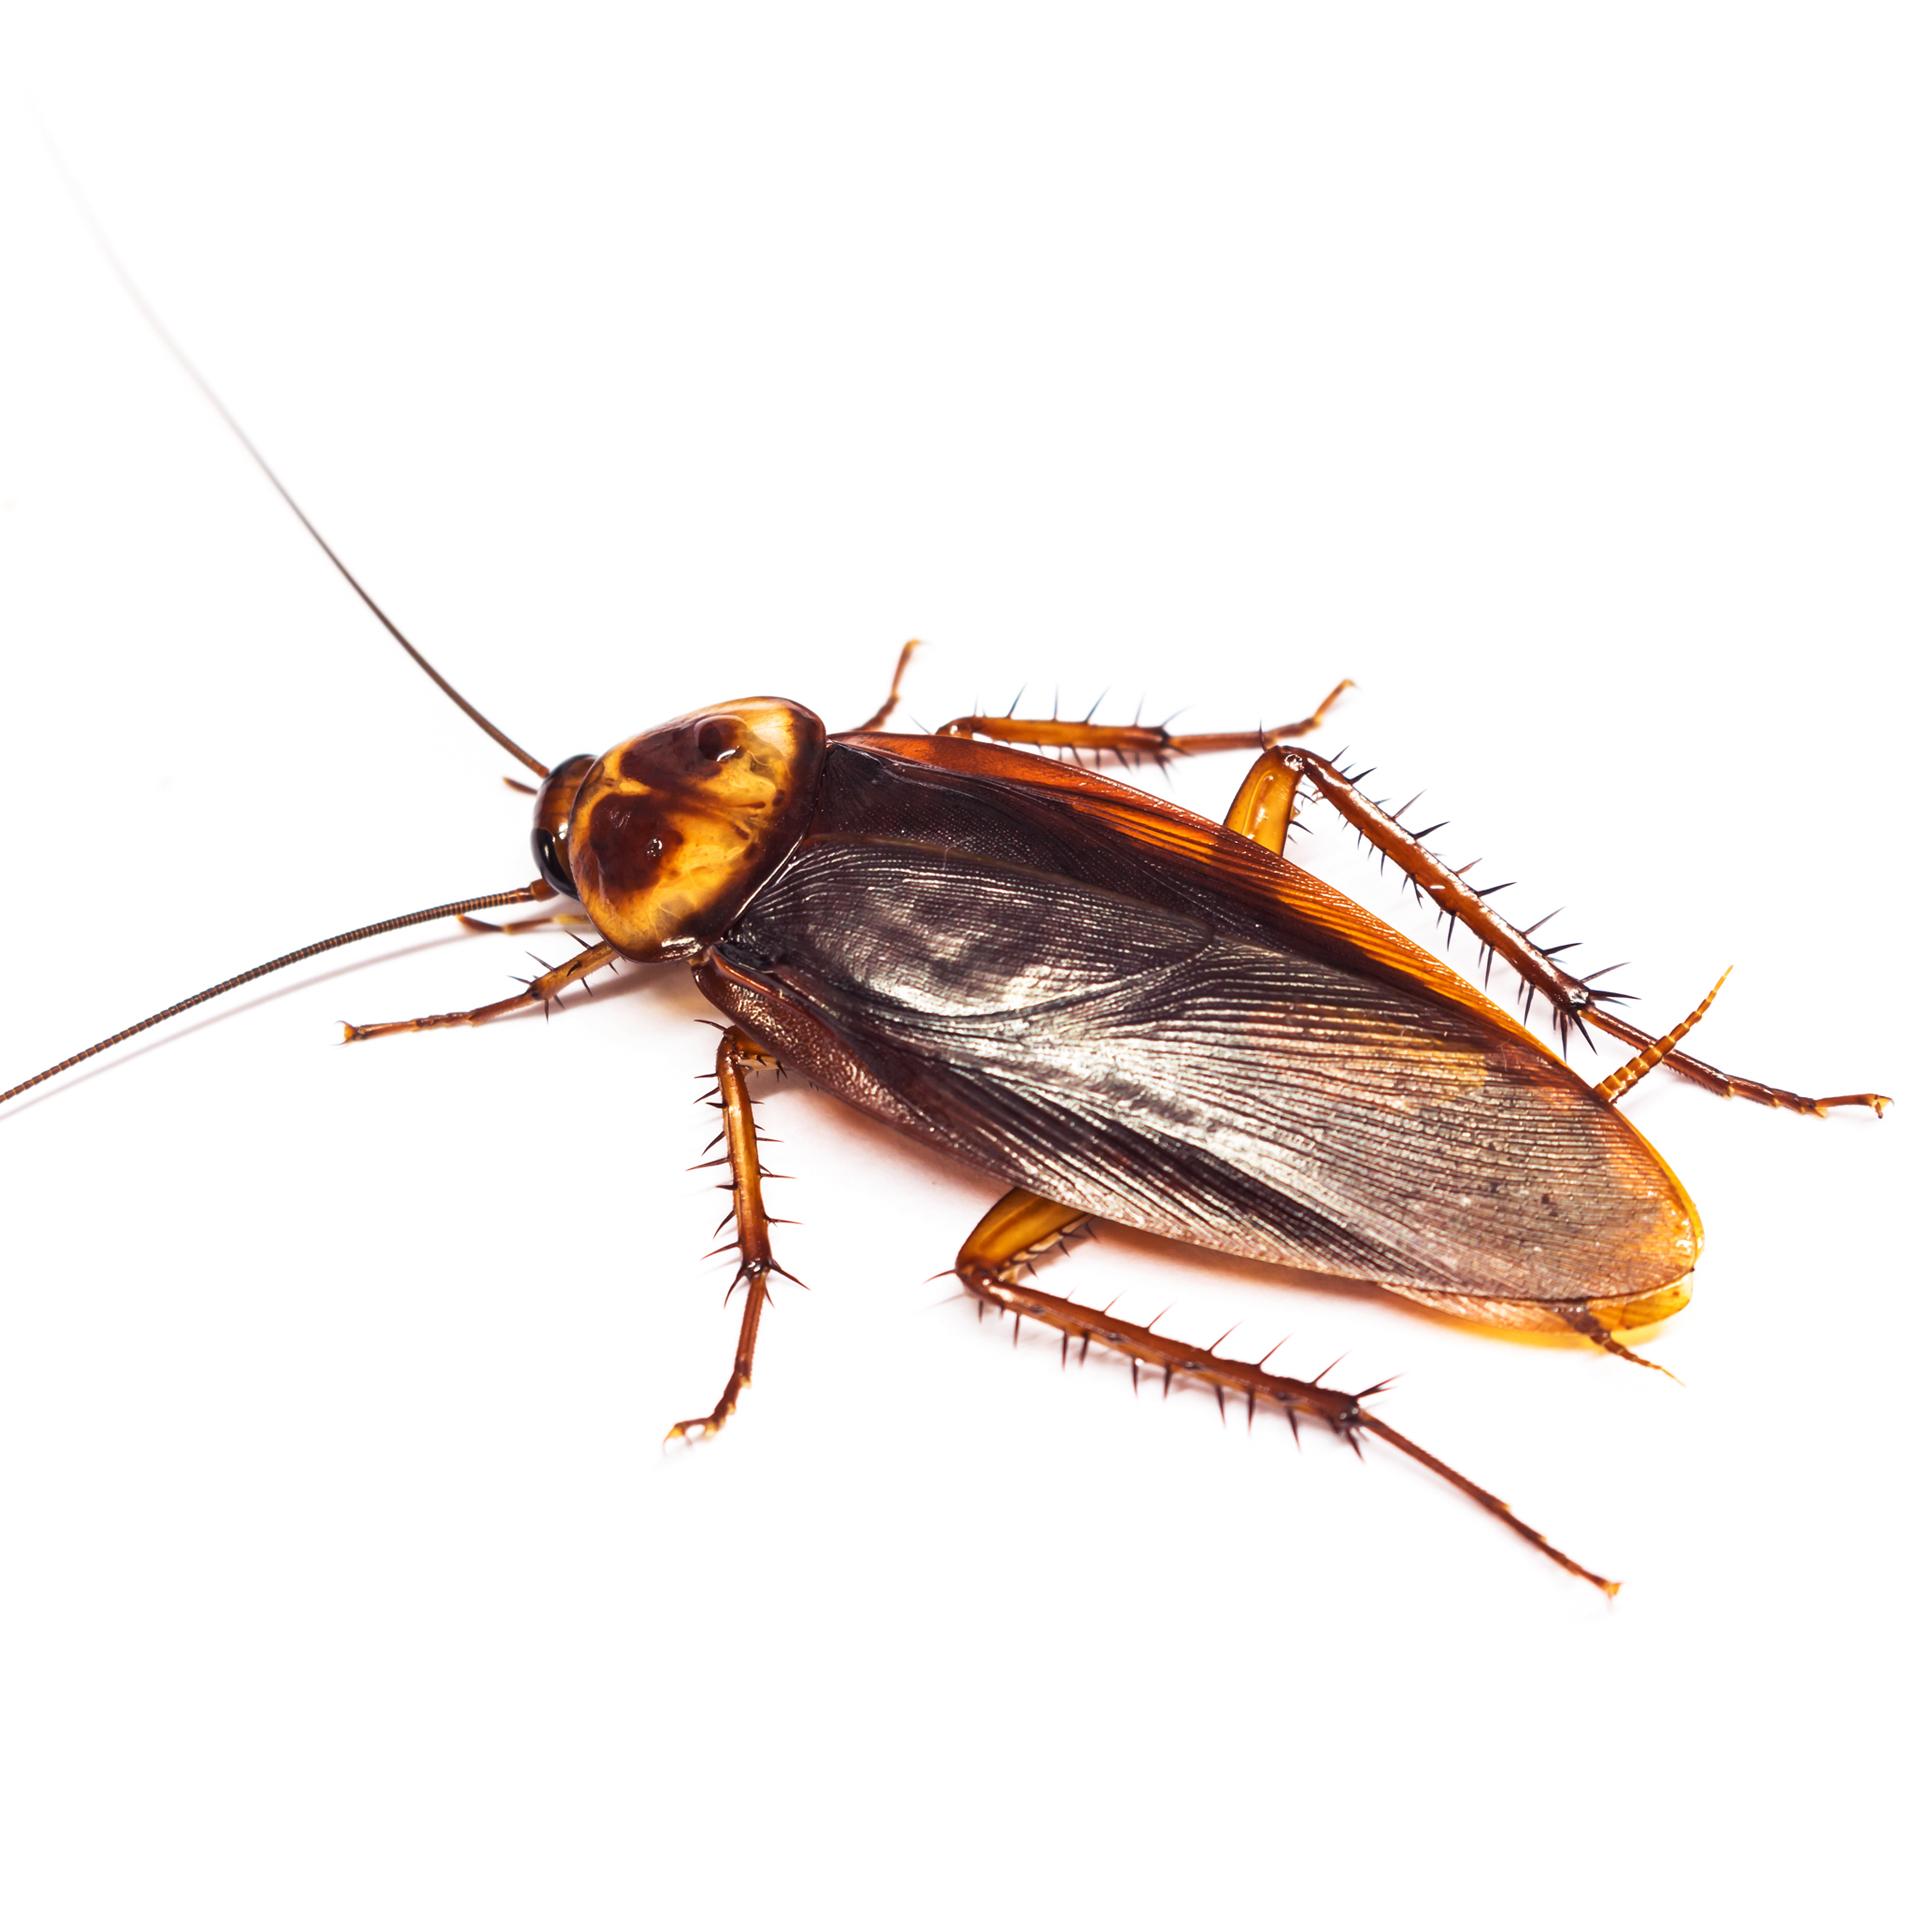 Roach white background